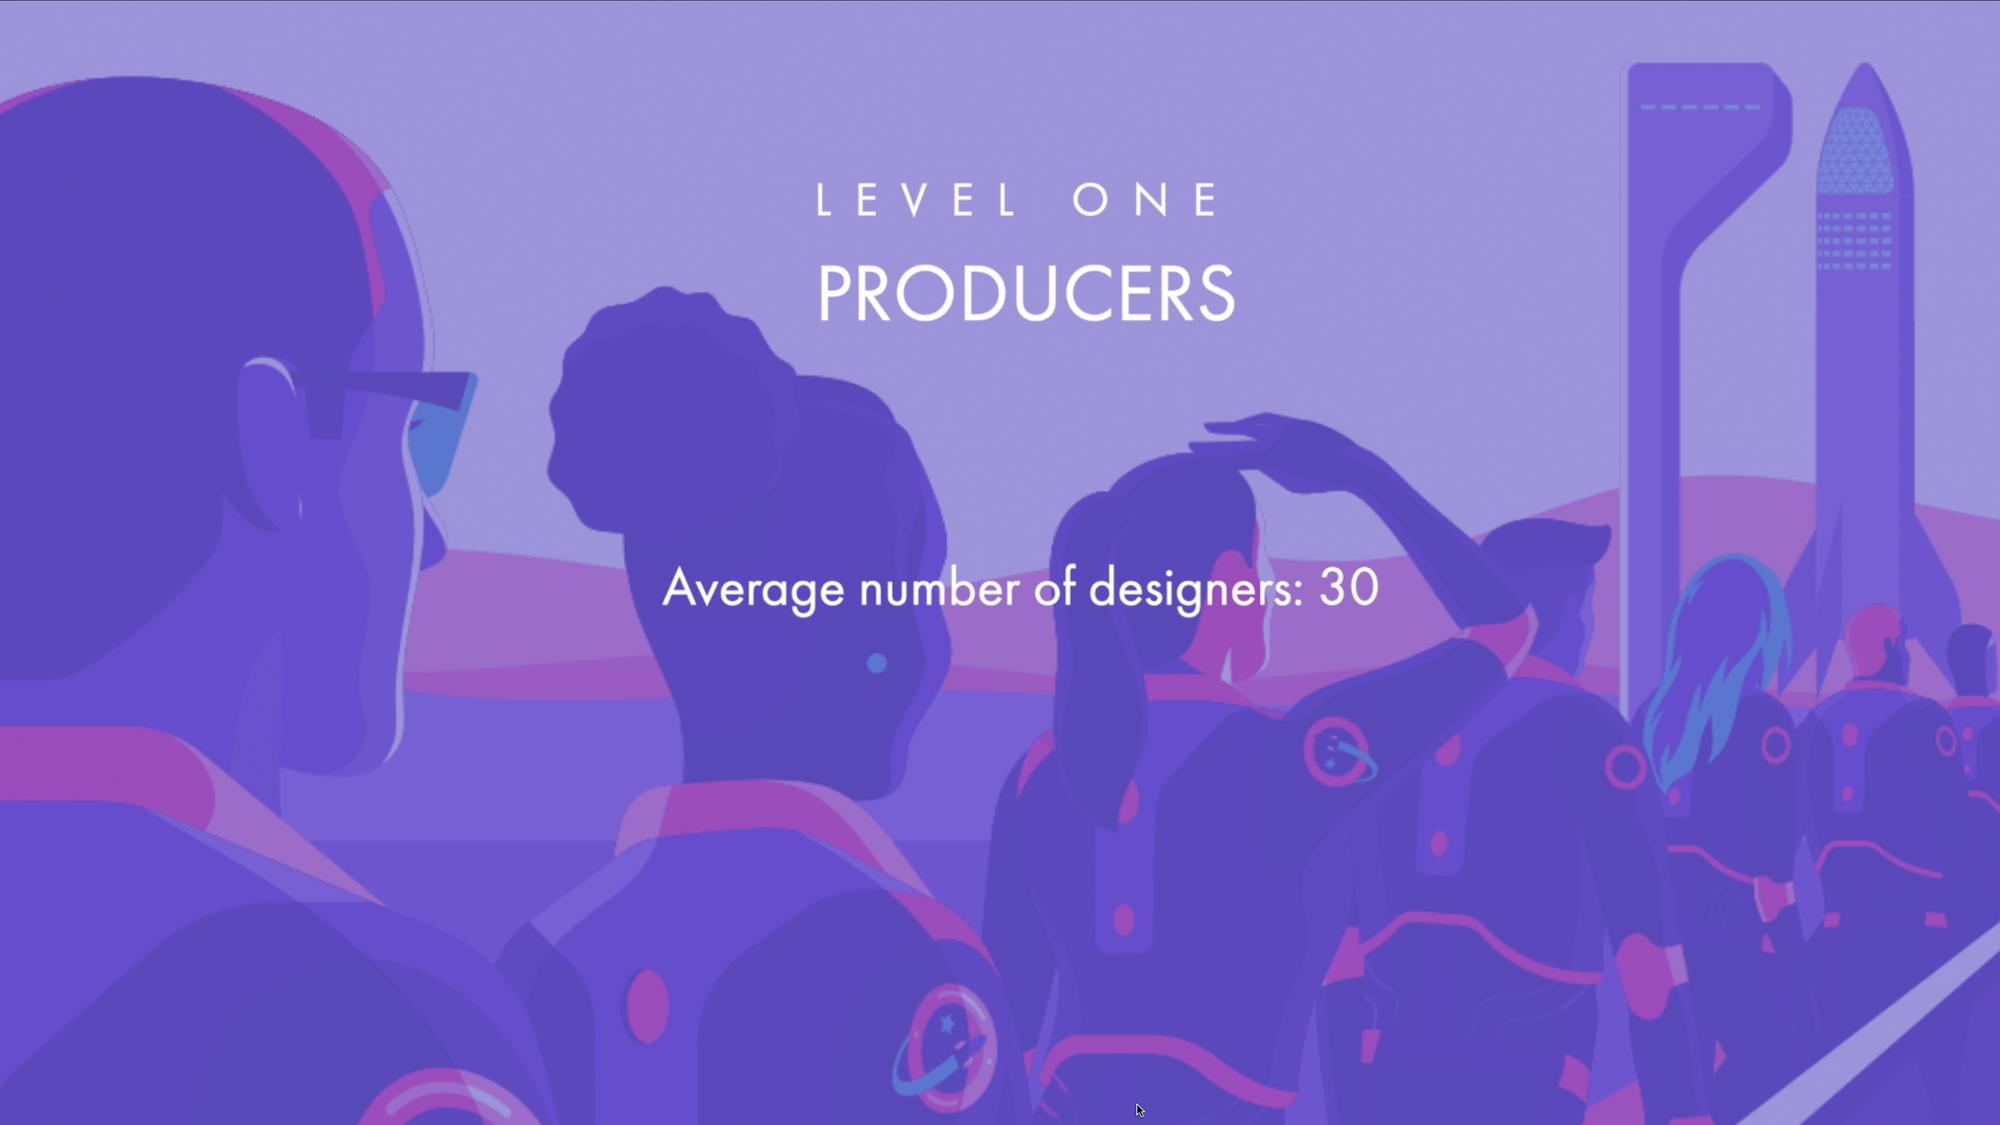 Level one producers